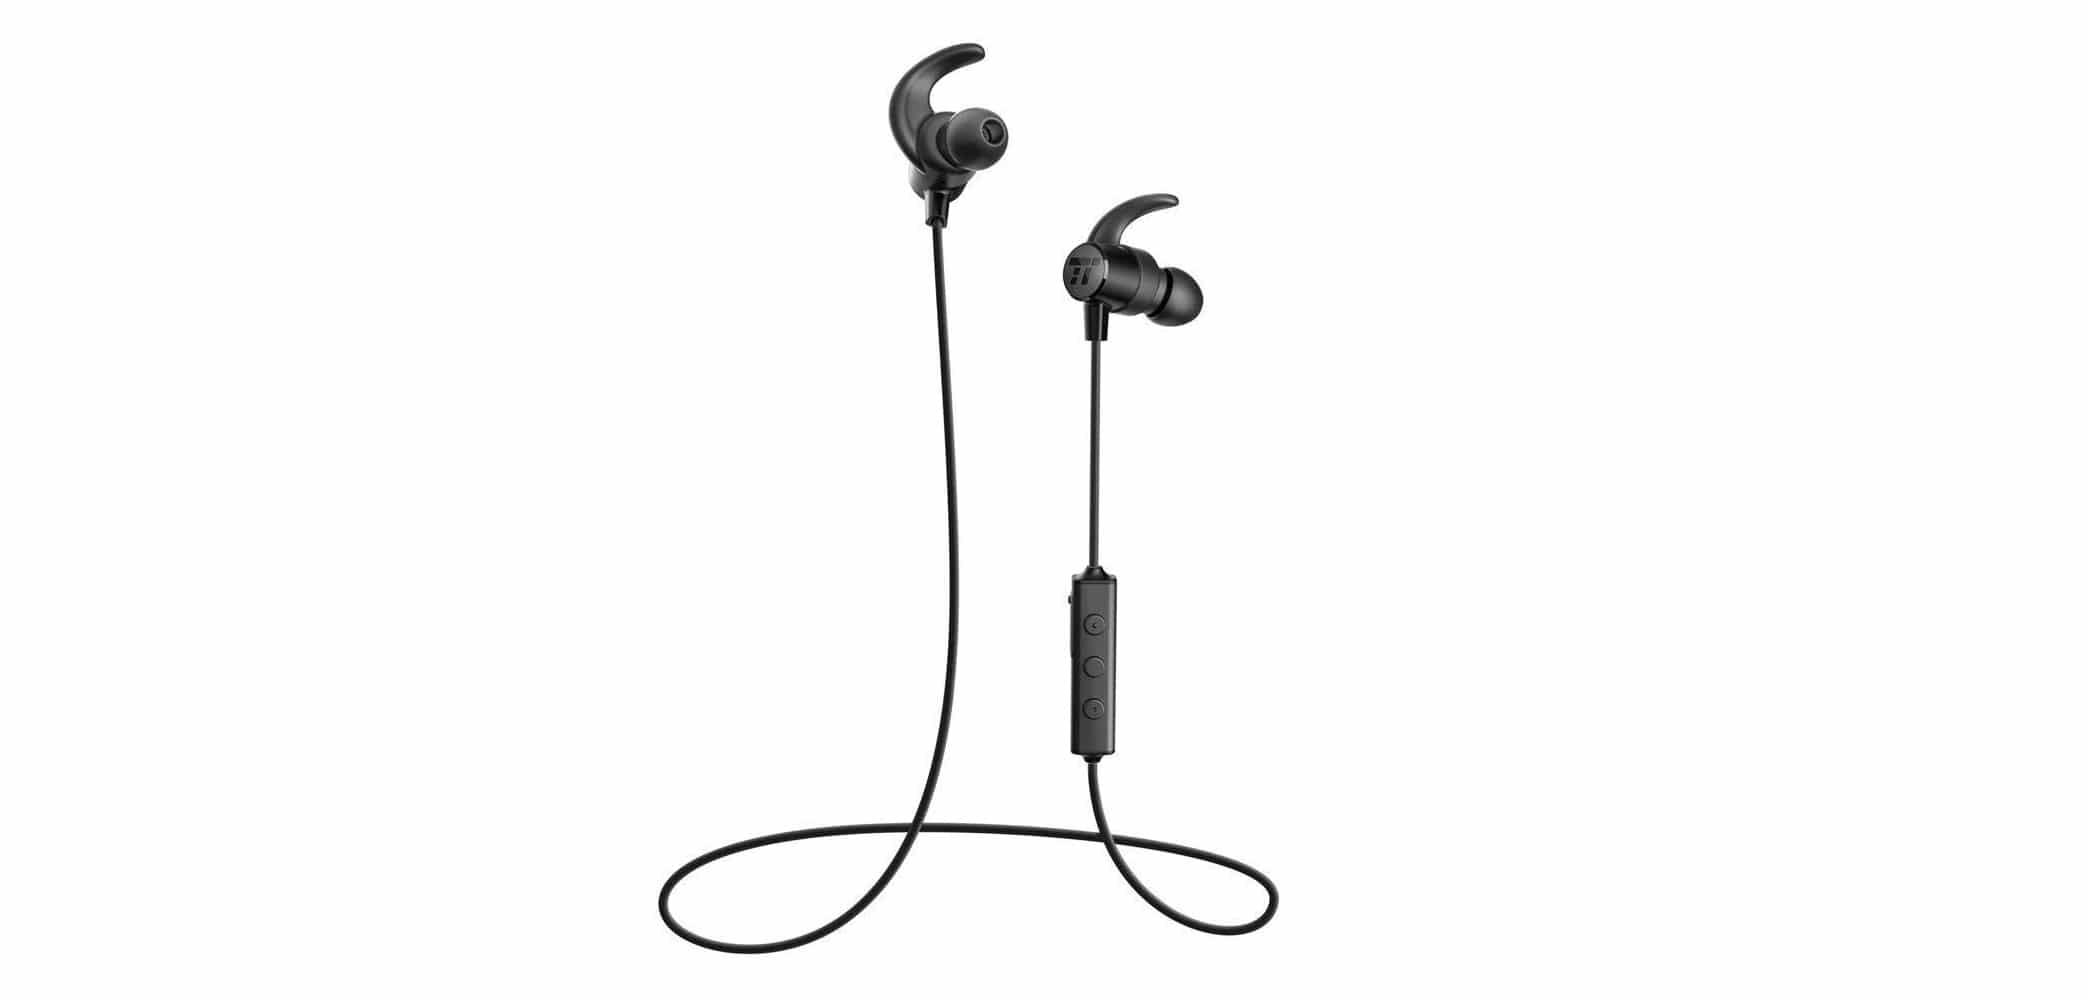 TaoTronics Bluetooth Headphones Wireless